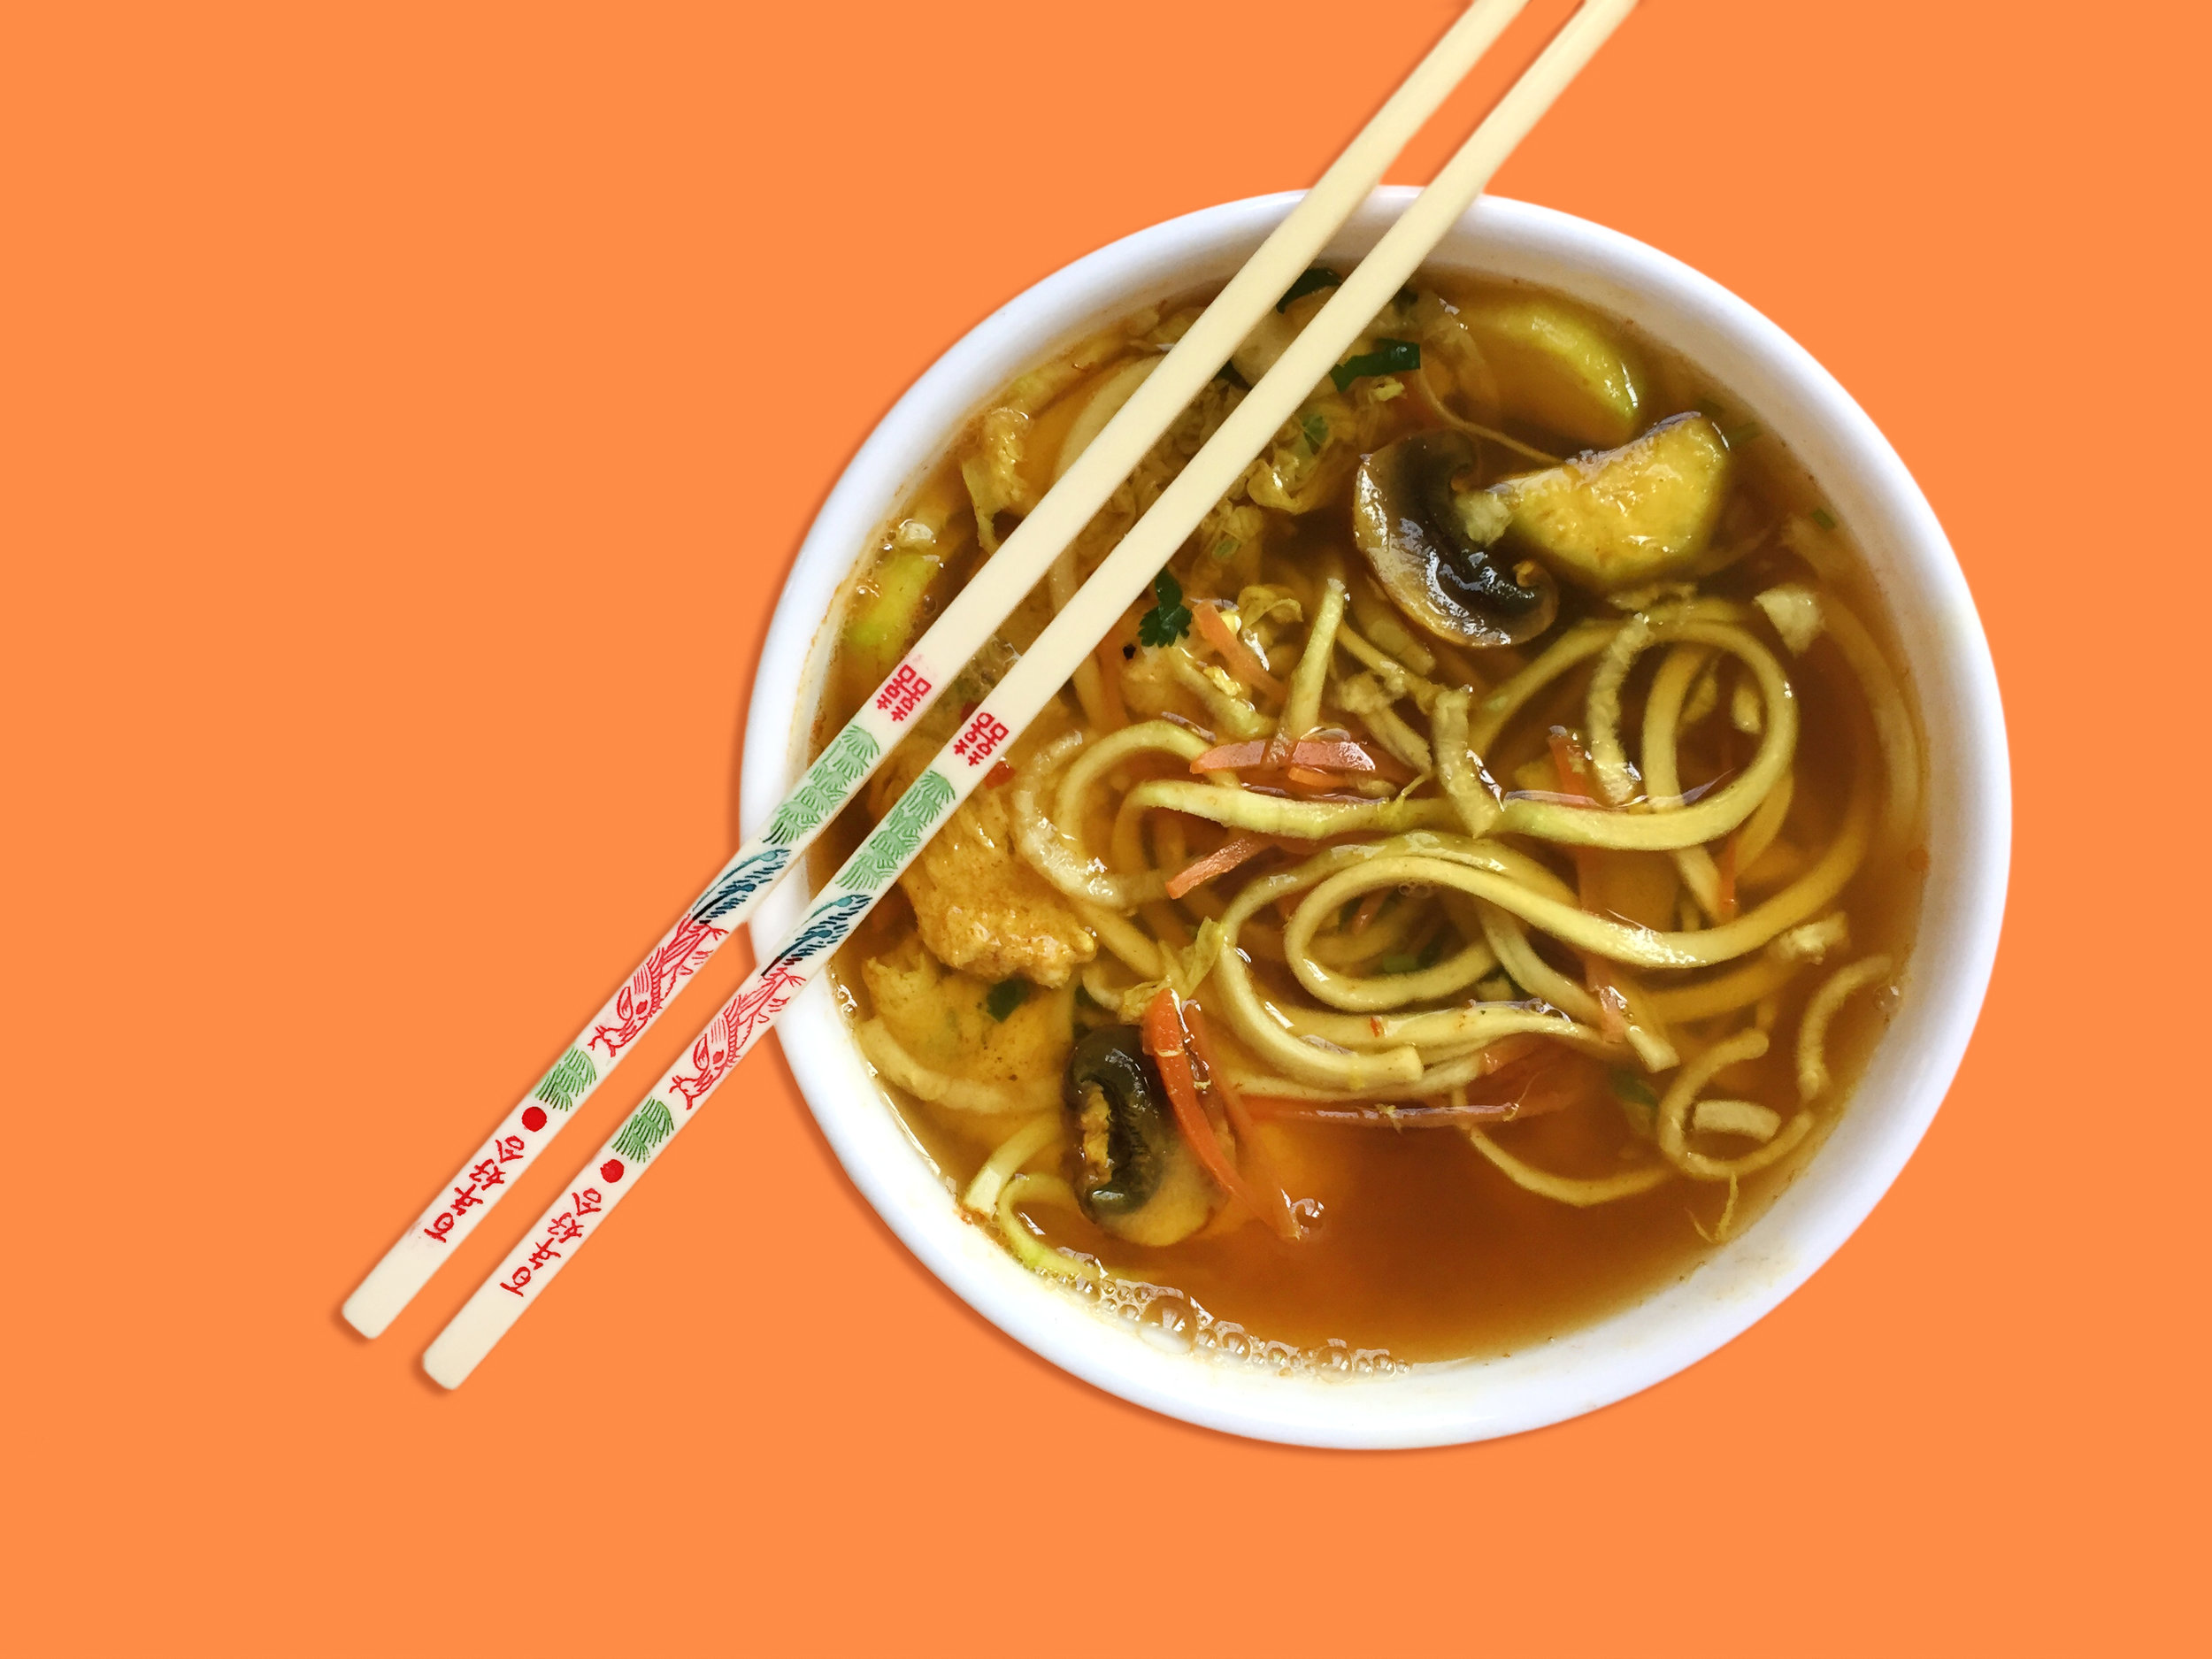 amy_chen_design_vegan_vegetarian_zucchini_noodle_ramen_noodles_recipe.jpg